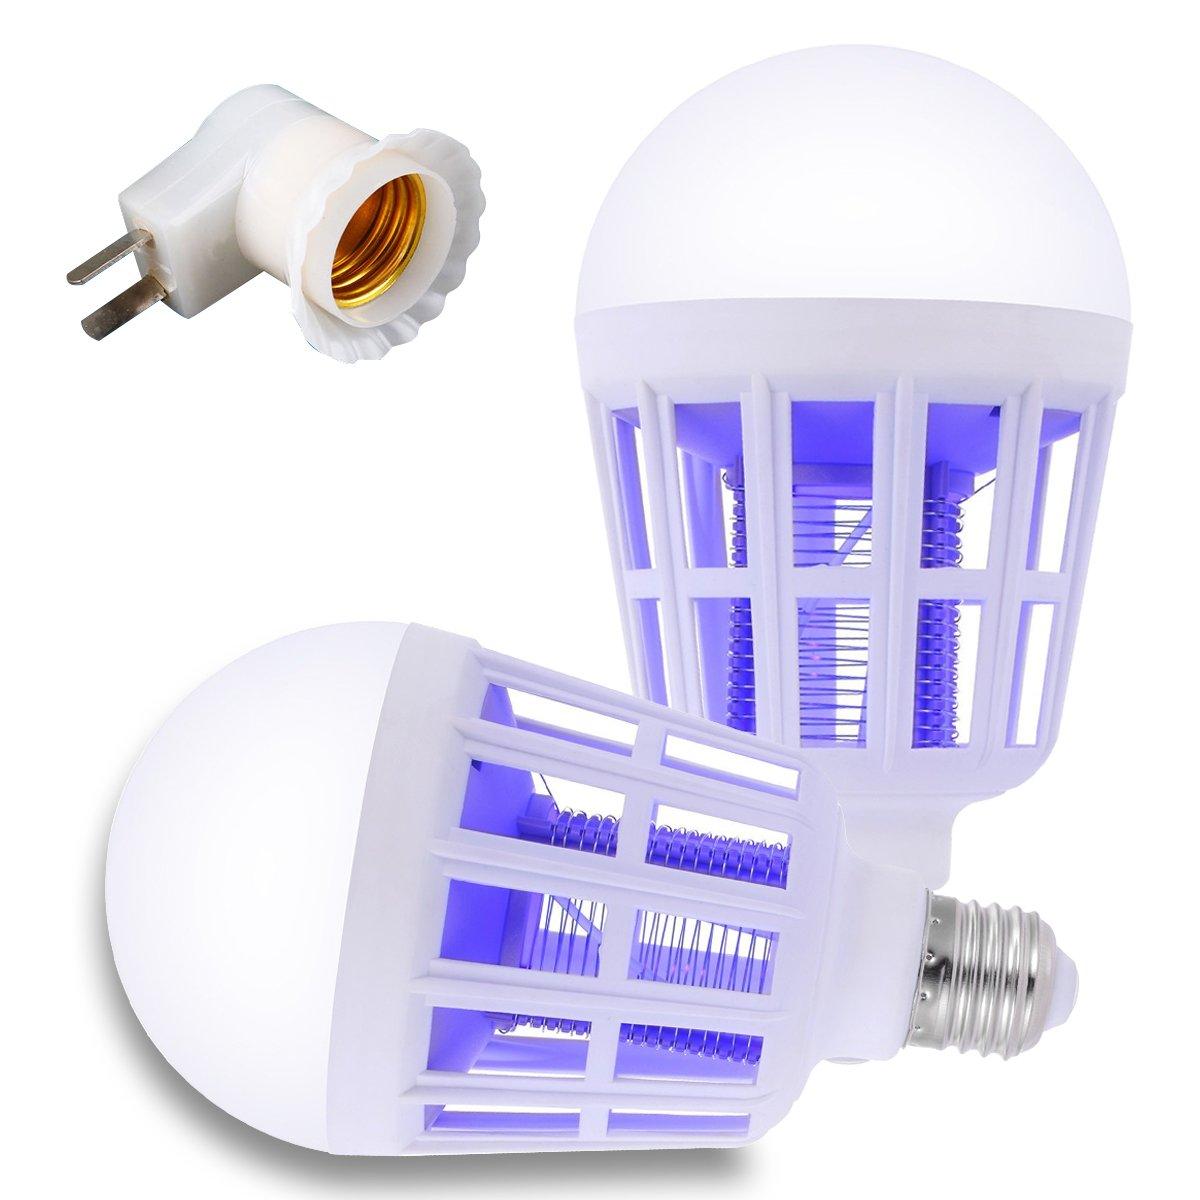 Mosquito Killer Lamp Fits in E26/27 Socket 15W 960LM 110V Bug Zapper Light Bulb Built-in Insect Trap For Indoor 0utdoor Bedroom Garden Balcony 2 Pack